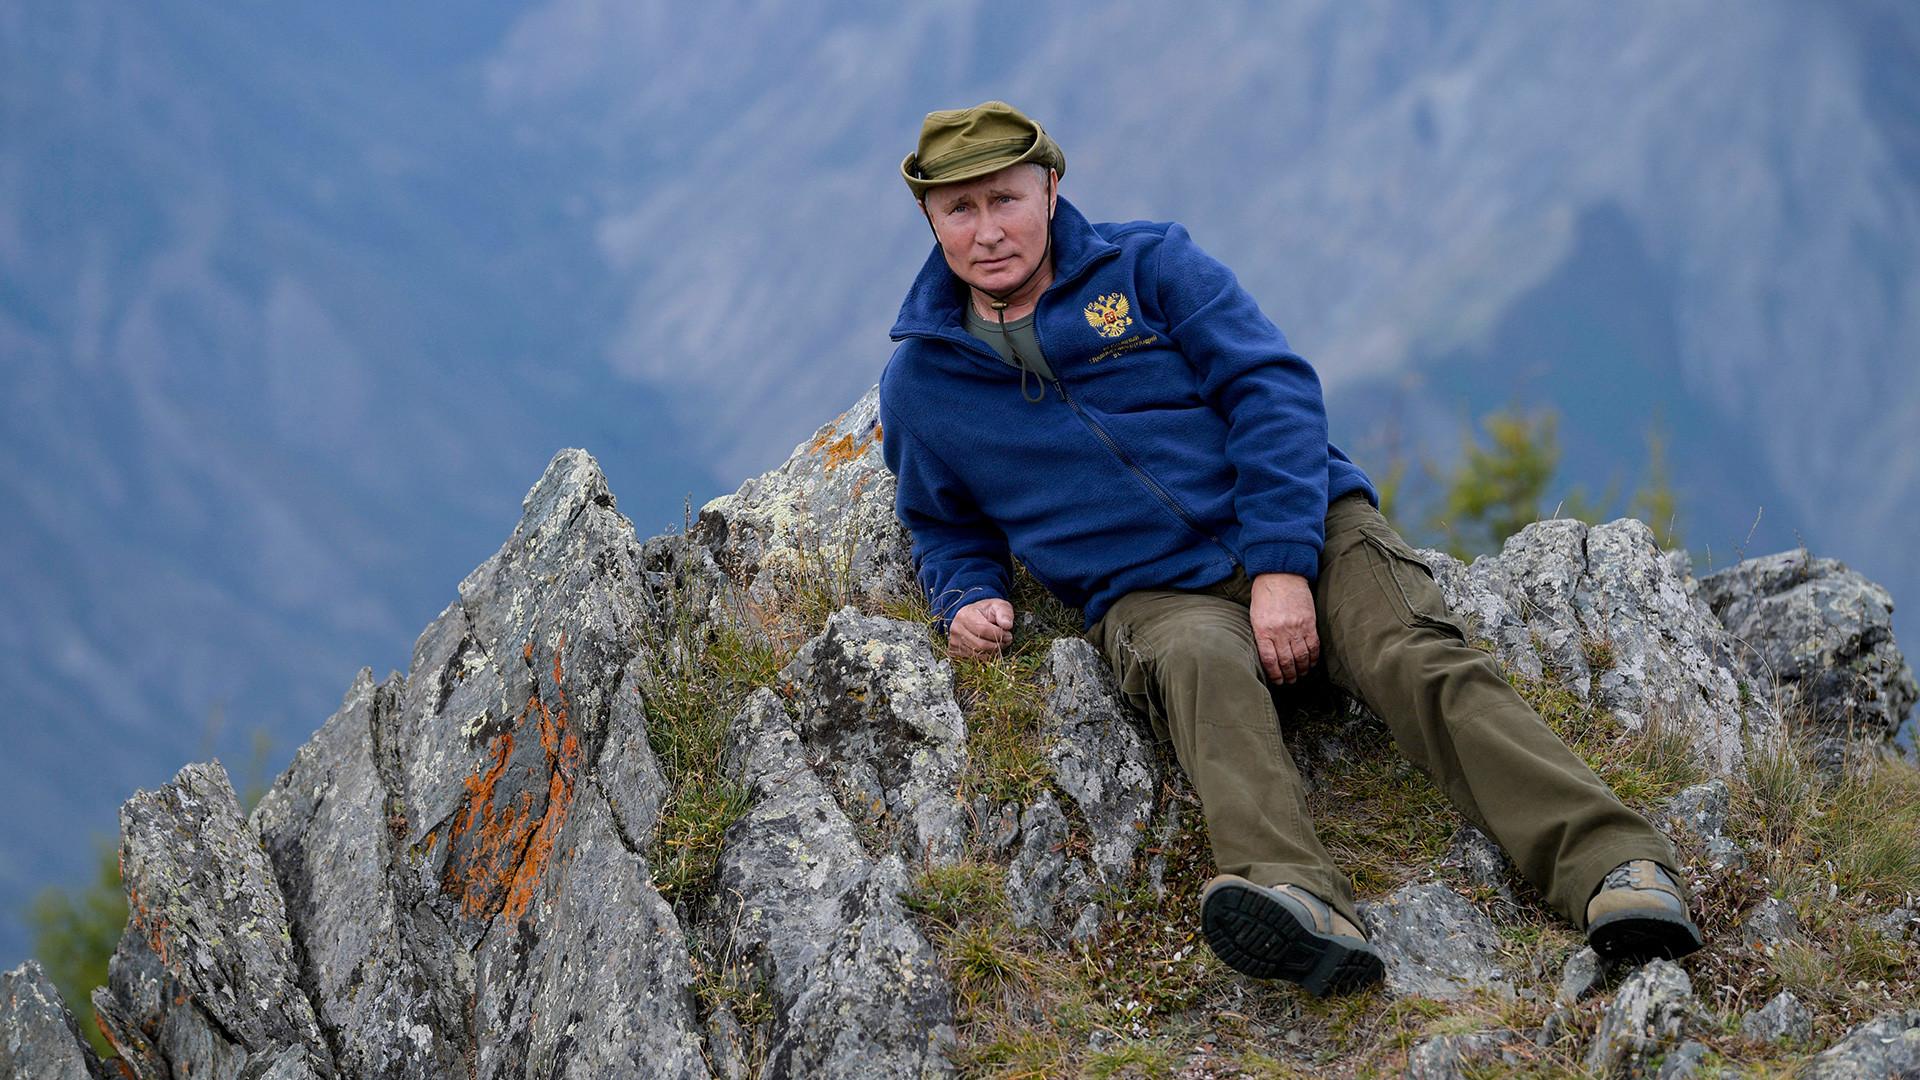 Presiden Rusia Vladimir Putin ketika tengah berlibur di taiga Siberia, Rusia, 7 Oktober 2019.